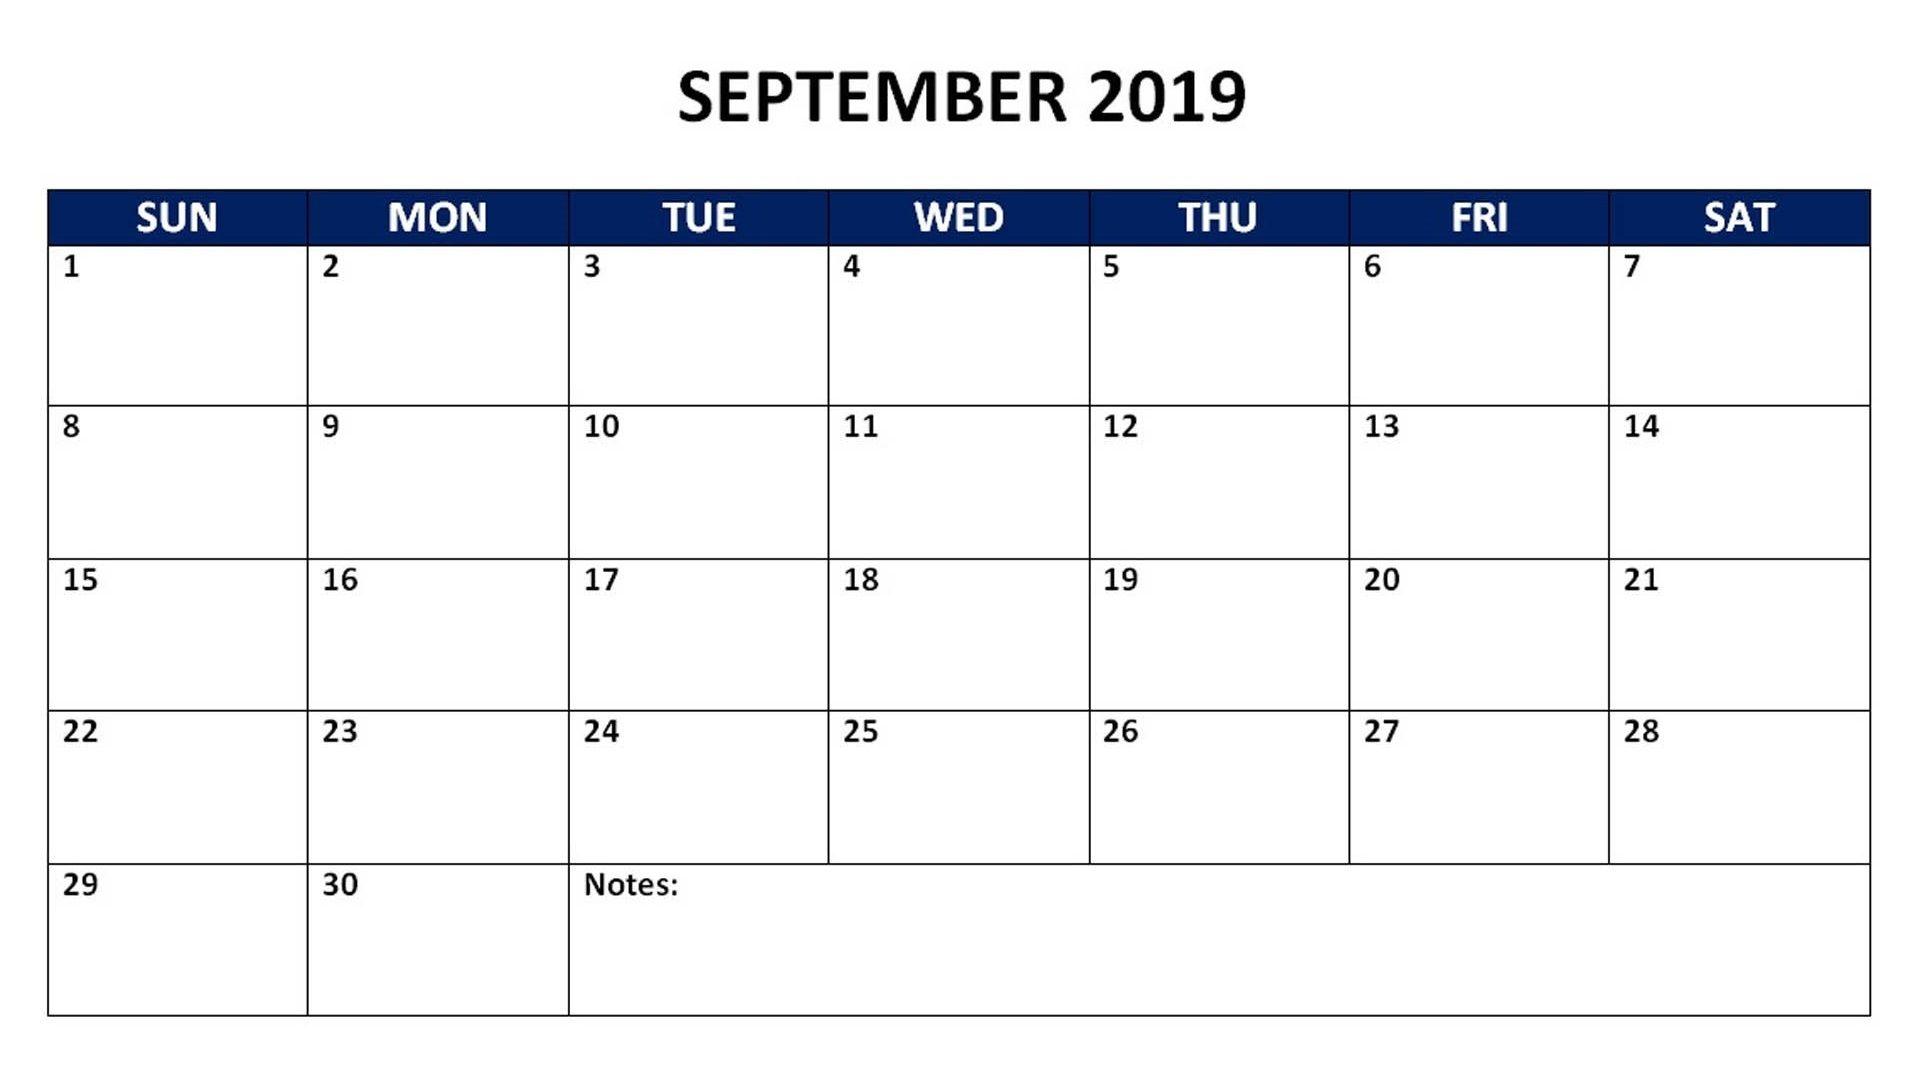 September 2019 Monthly Calendar 2019 Calendars Pinterest